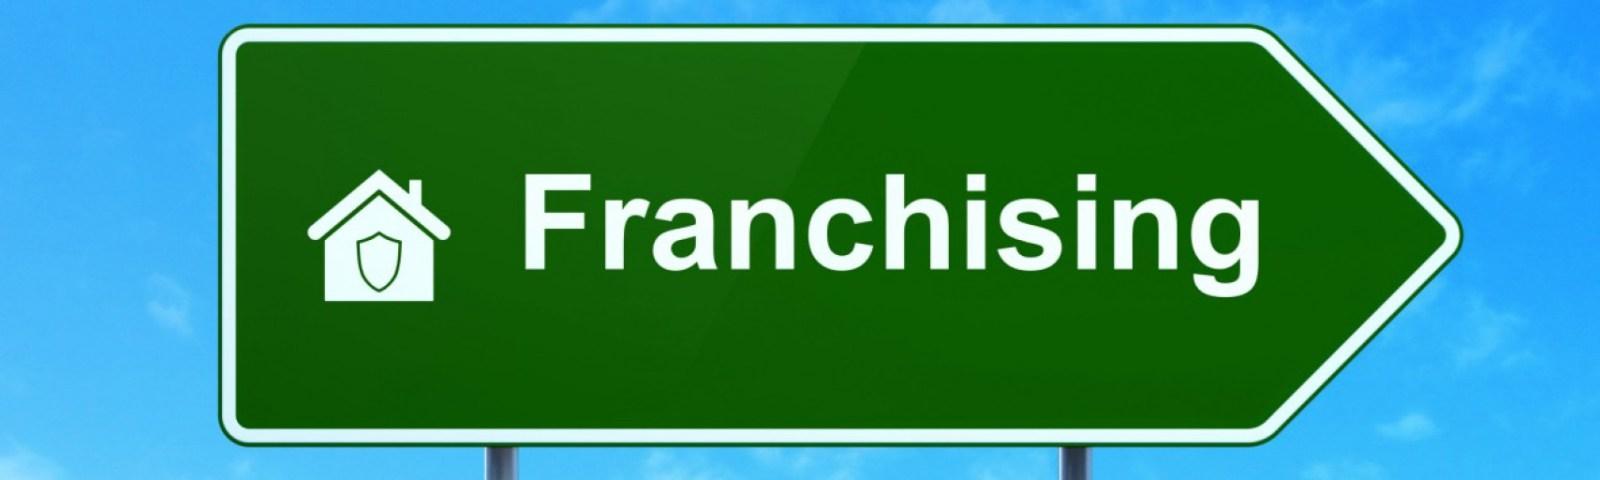 1240-franchising